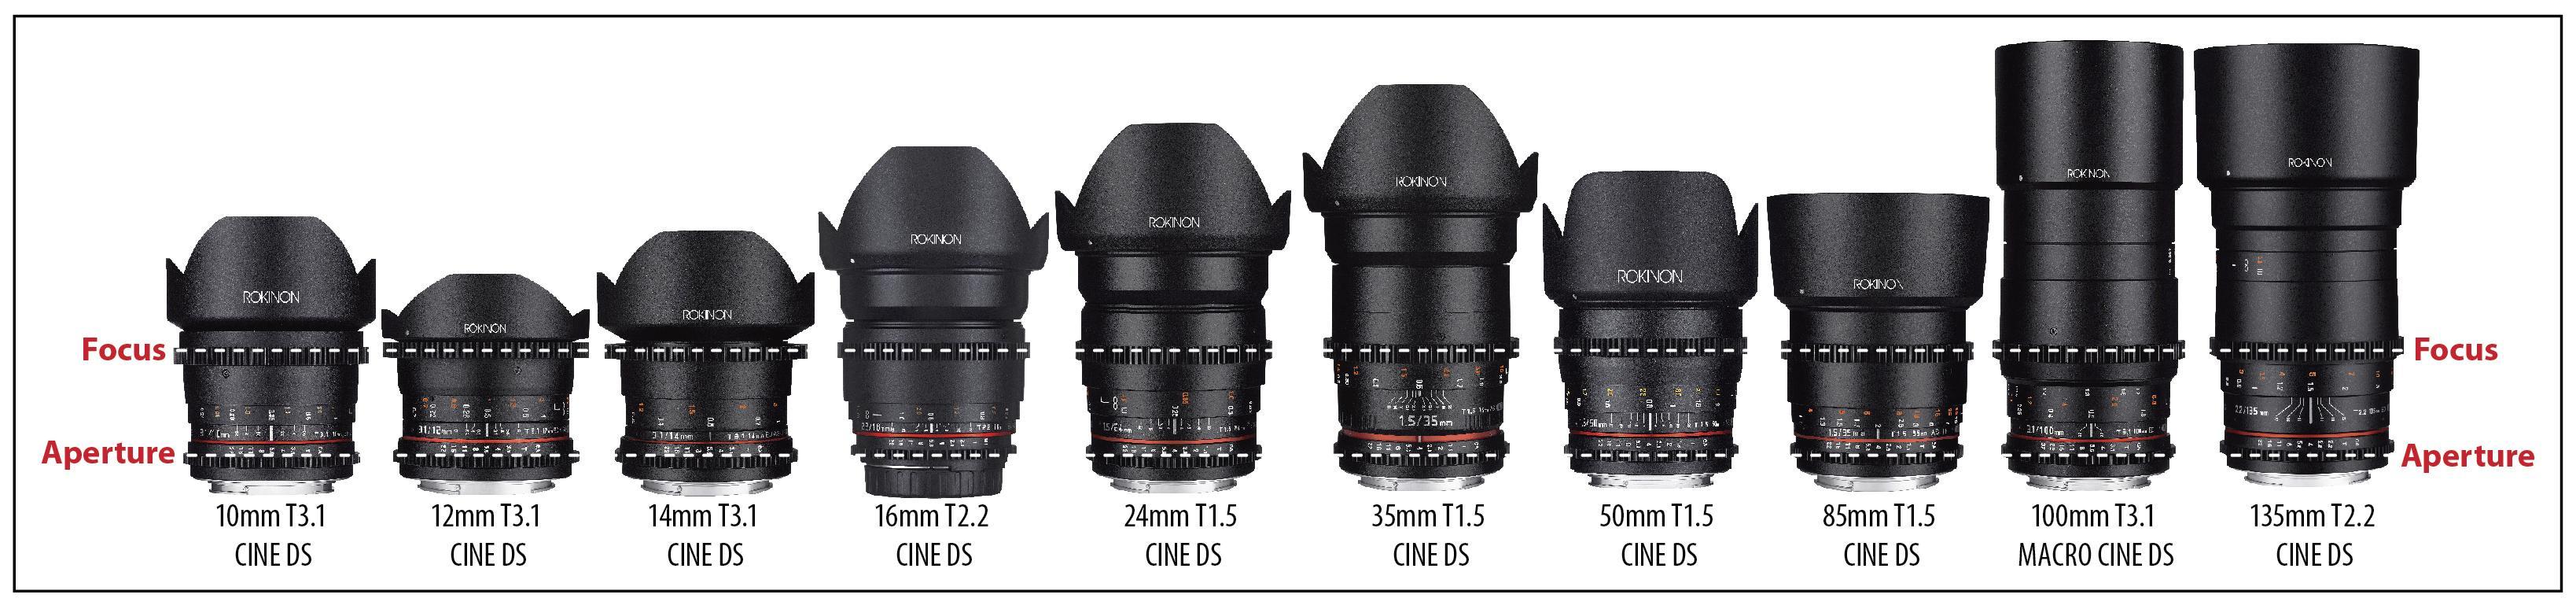 Buy Rokinon Cine DS 12mm T3 1 Ultra Wide Cine Fisheye Lens for Nikon